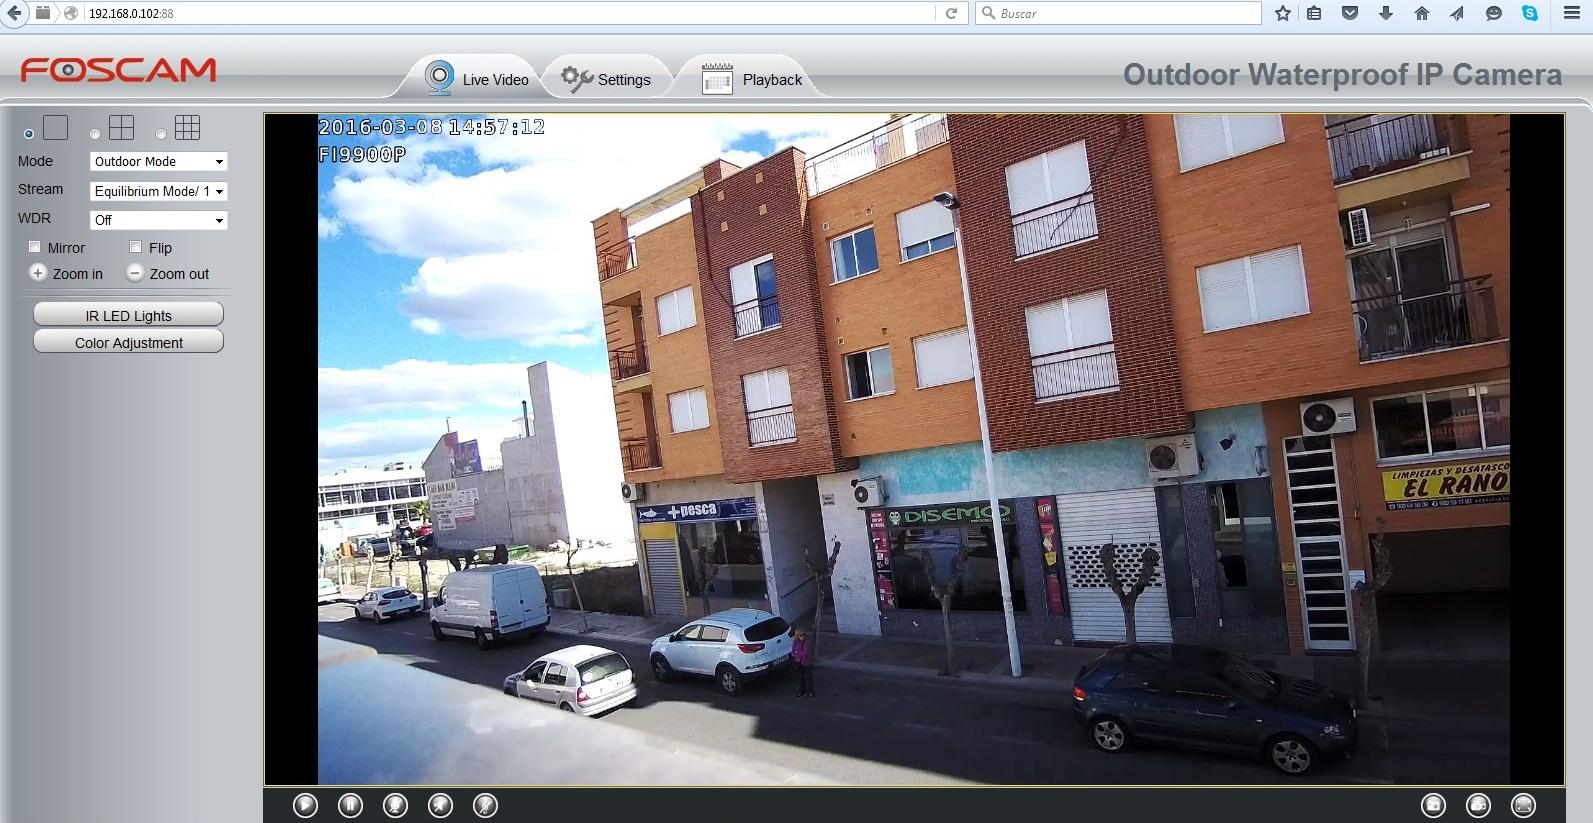 Demostración Foscam FI9900P Angulo 118º Resolución HD 1080P